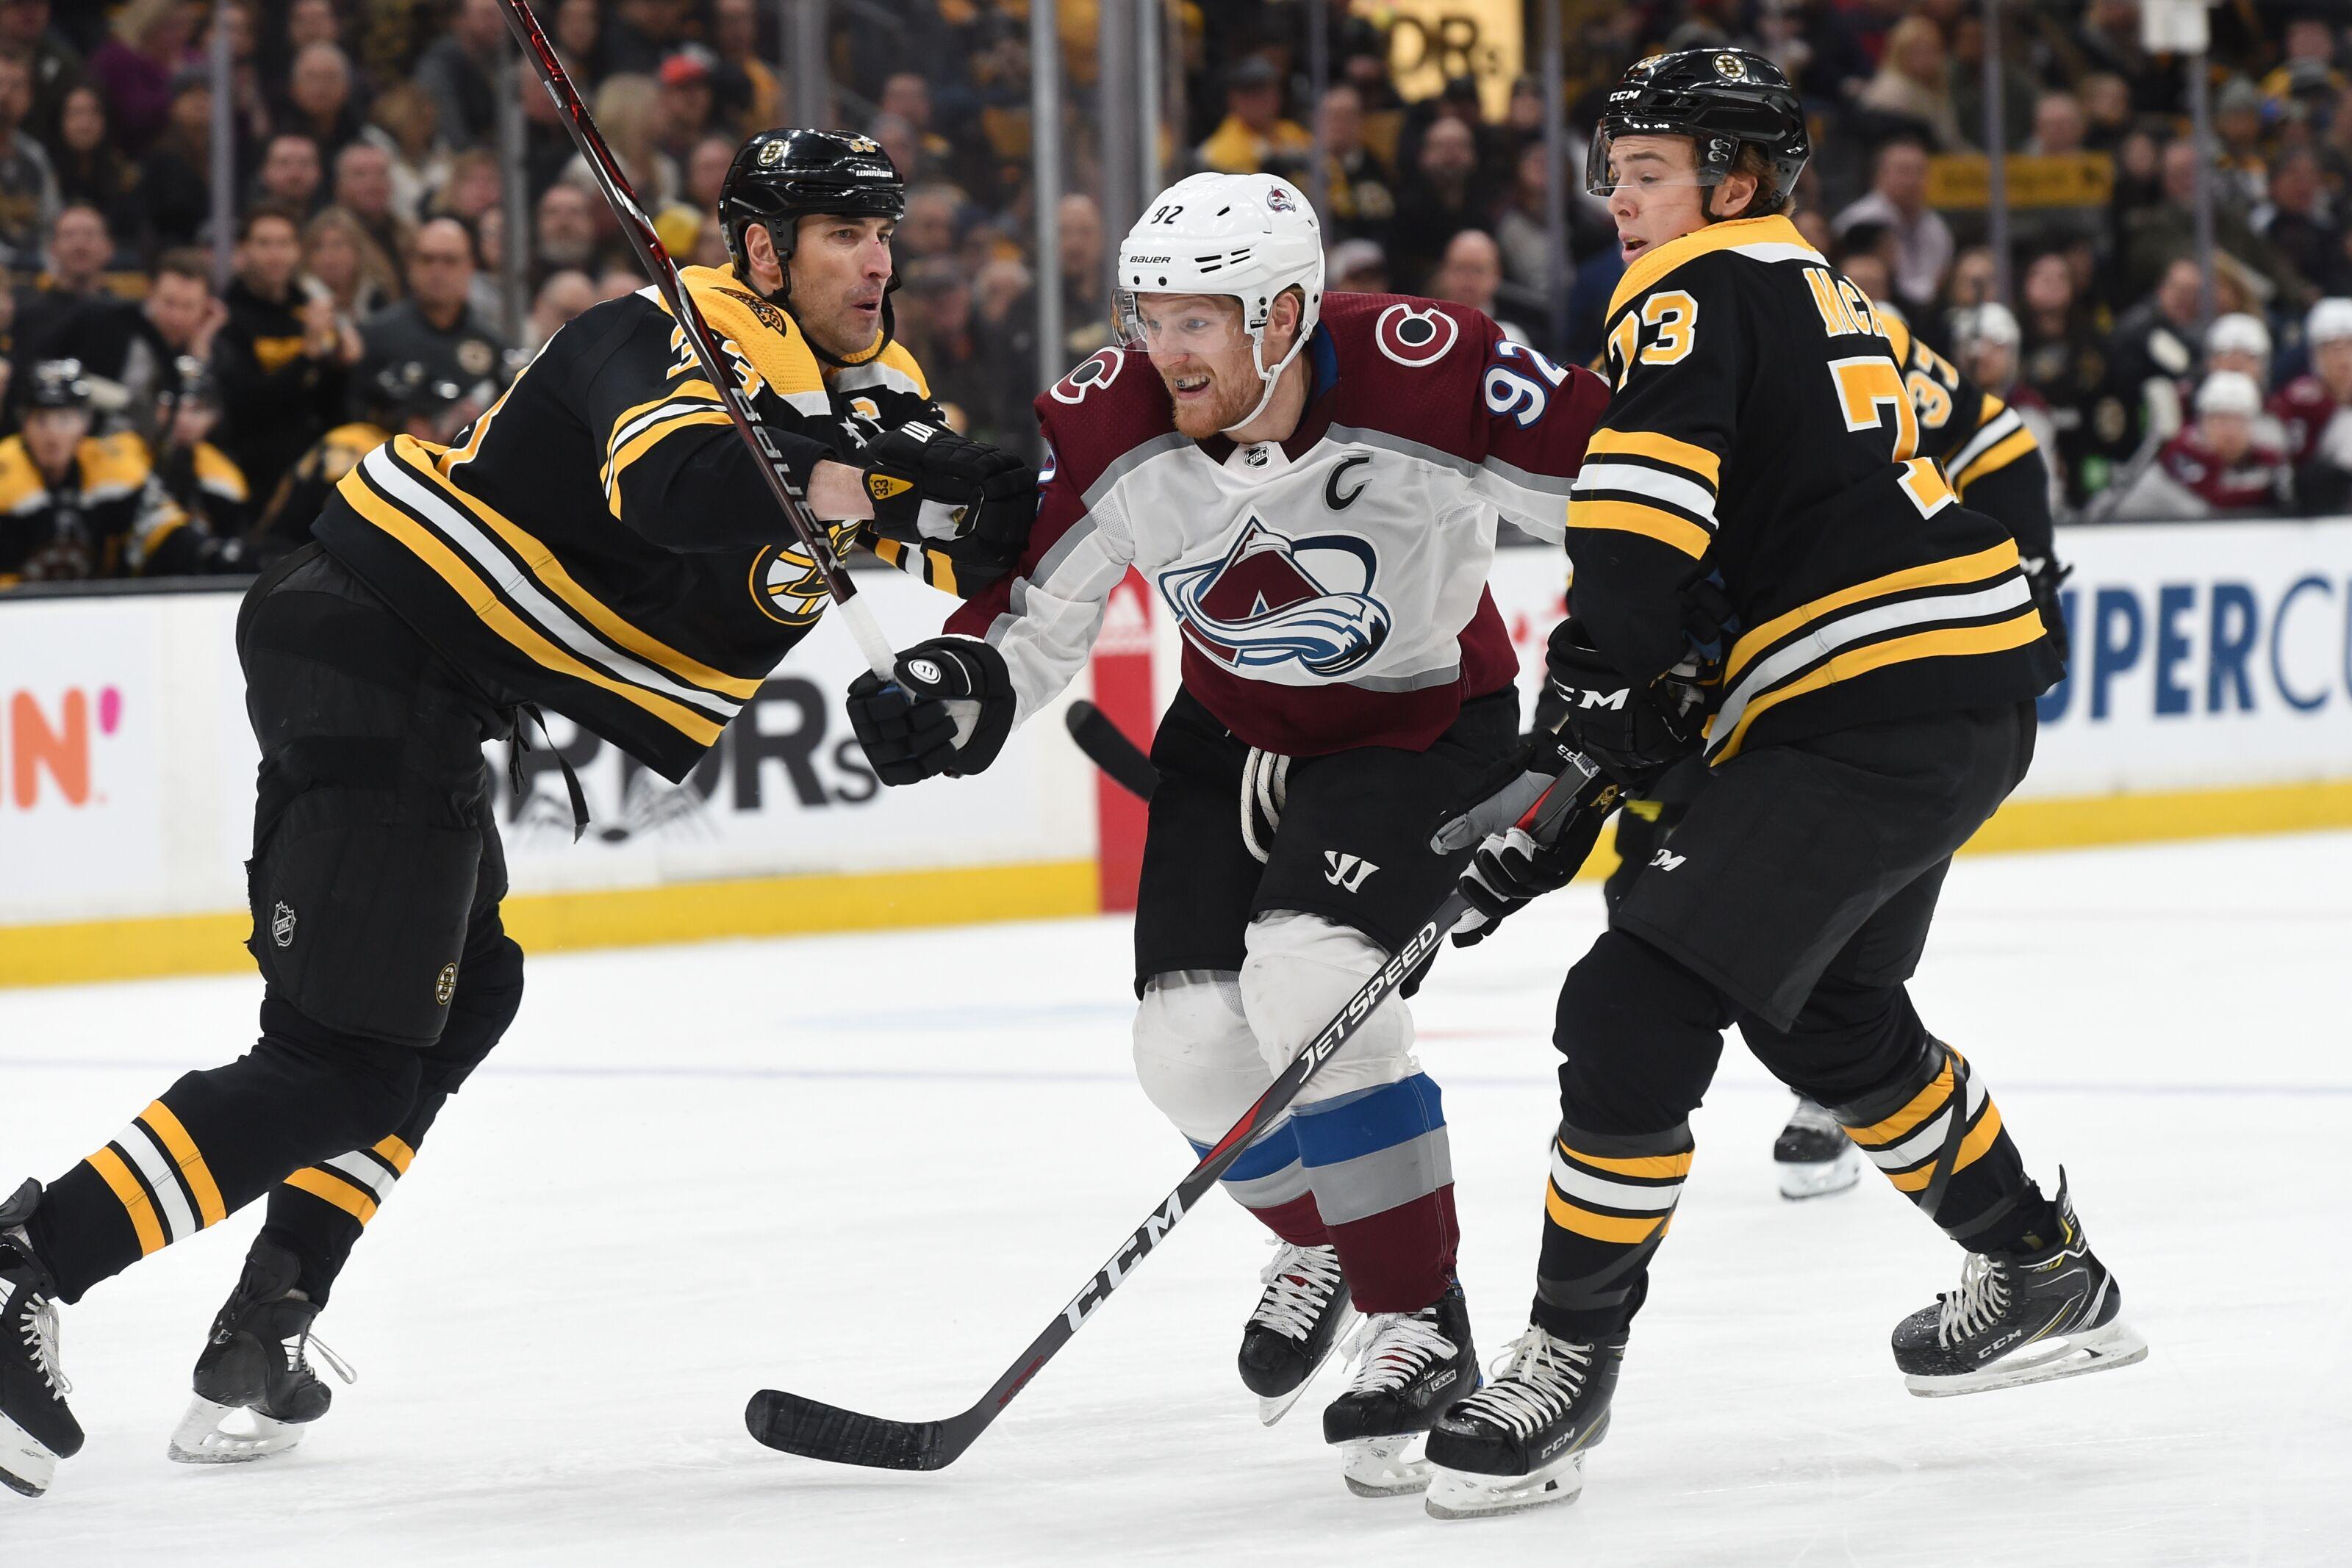 Boston Bruins vs Colorado Avalanche: Start time, live streaming, TV info